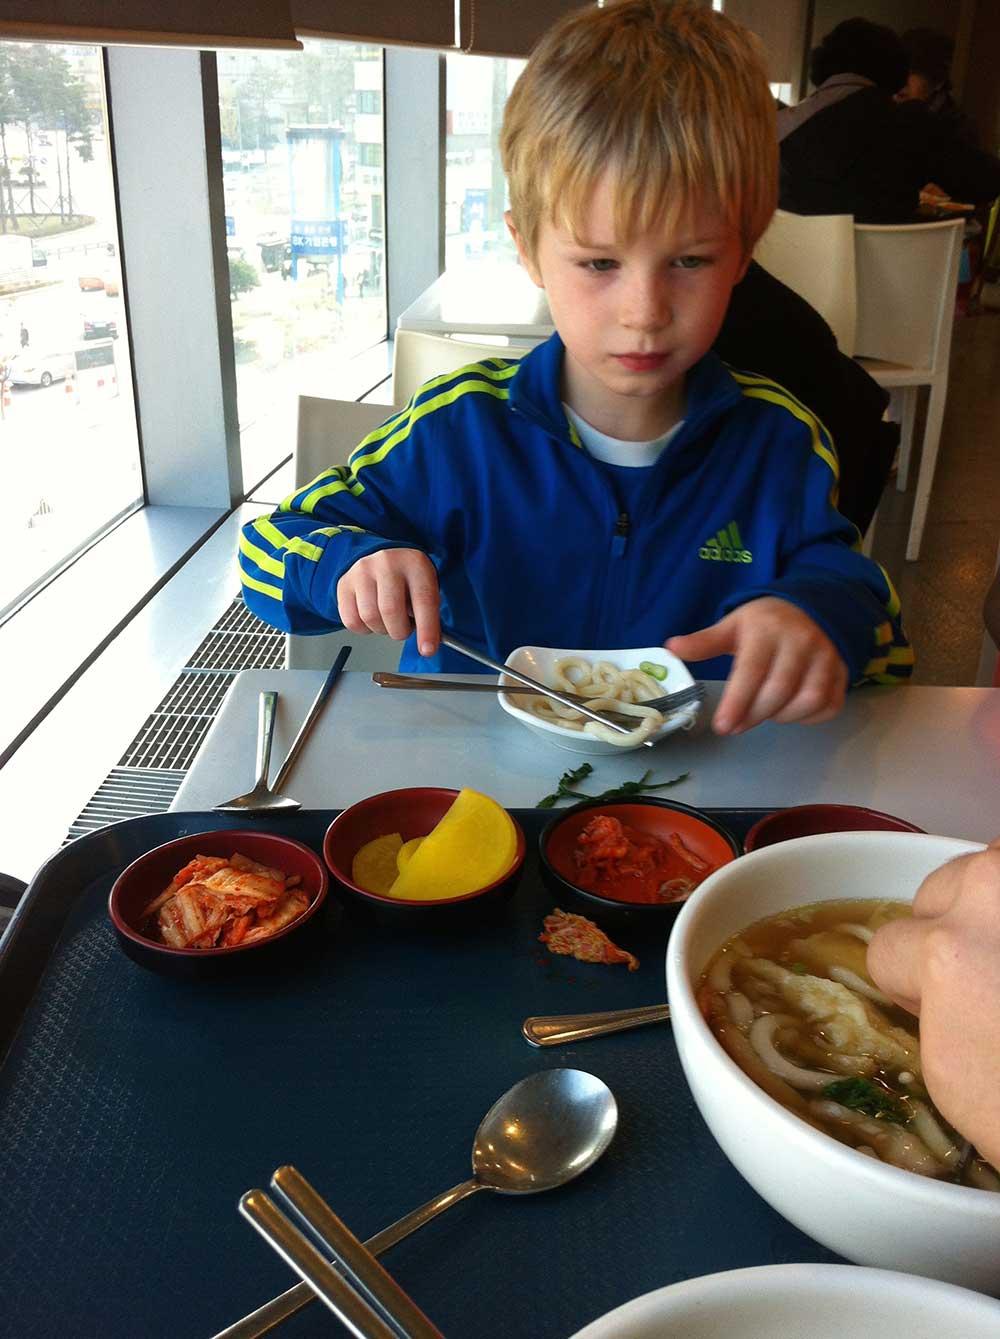 Food in South Korea